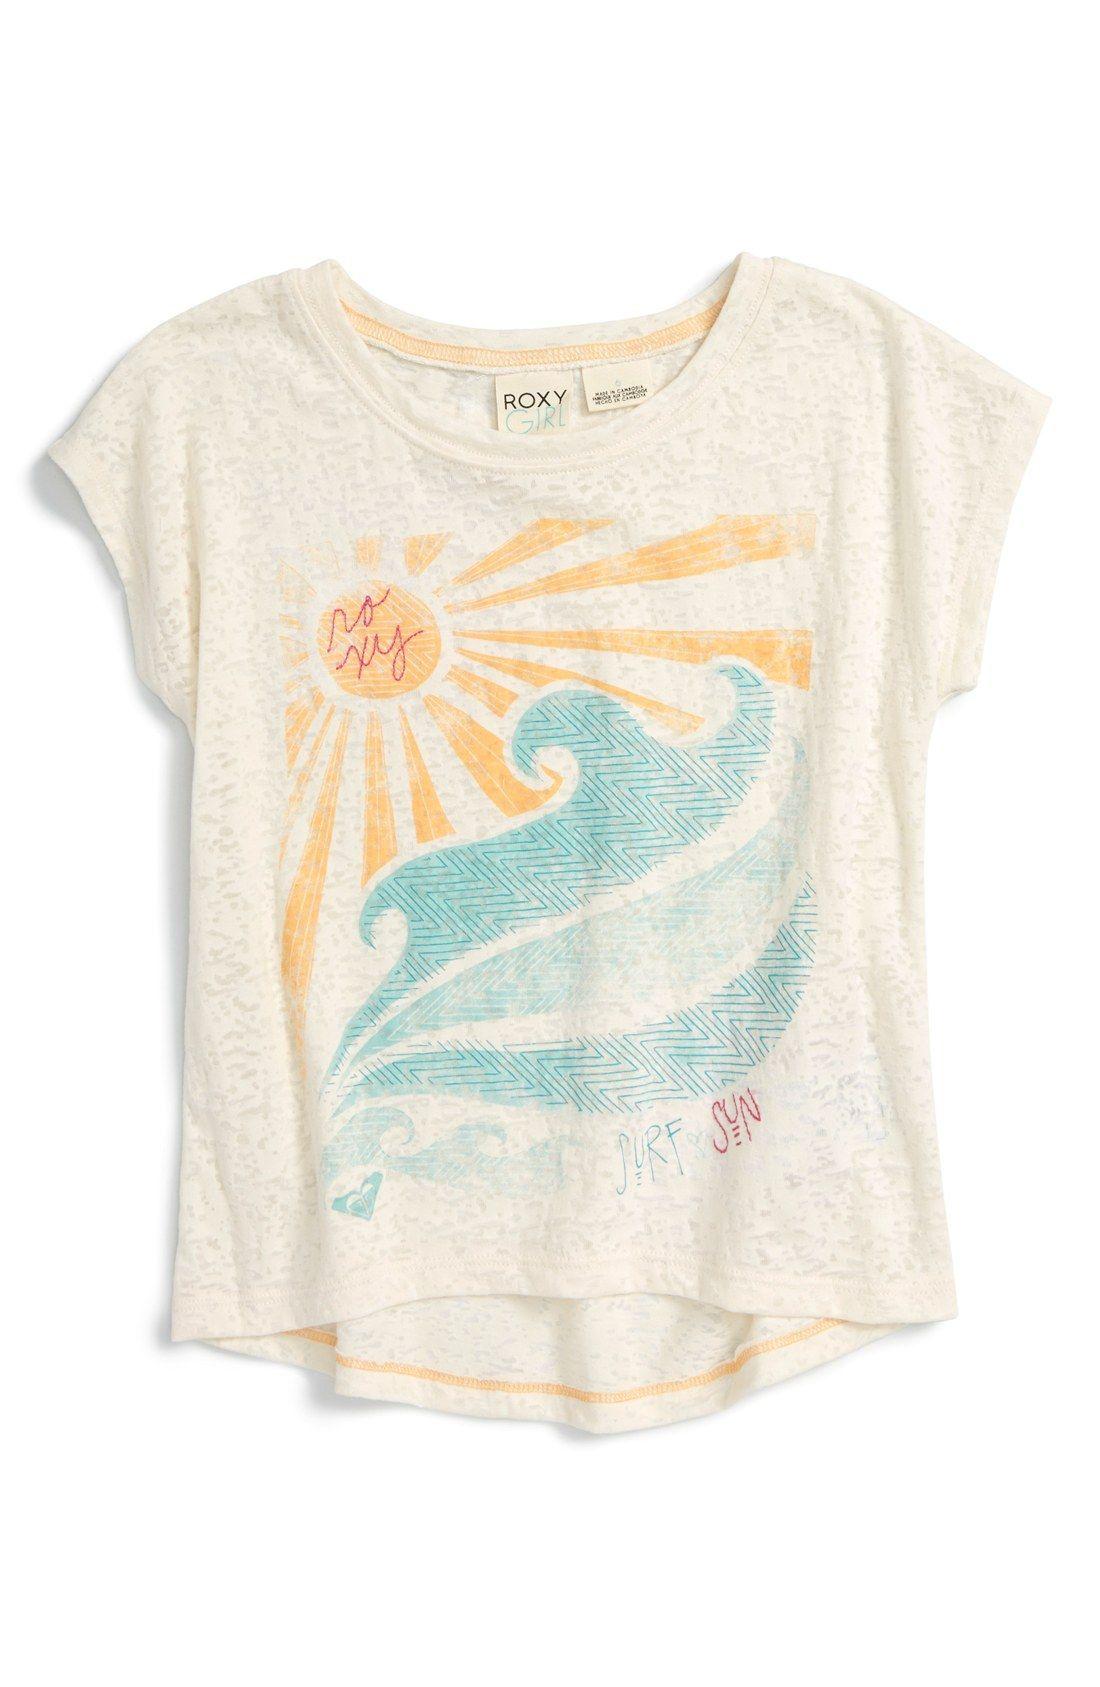 5f87dc6259e3 Surf Hair, Surf Girls, Roxy Clothing, Summer Clothing, Kids Shirts, Tee